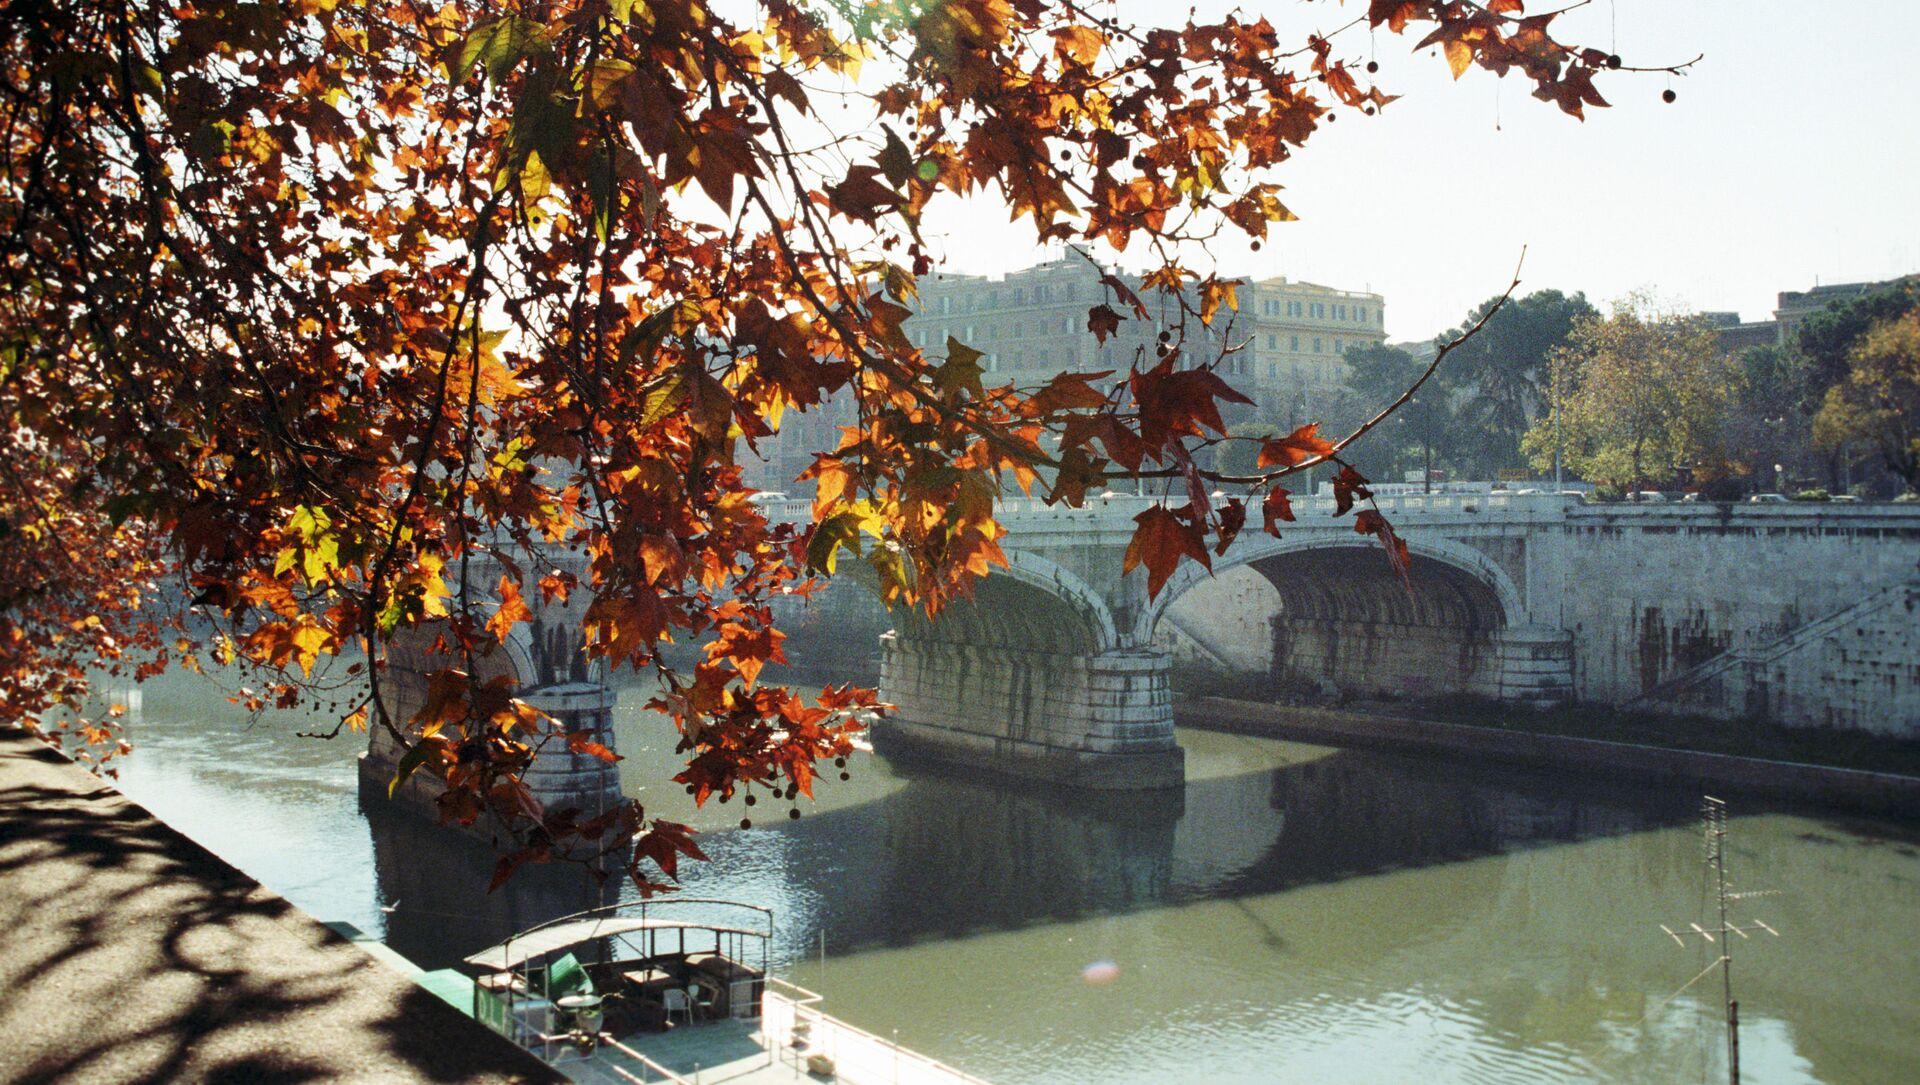 Il fiume Tevere, Roma - Sputnik Italia, 1920, 07.02.2021